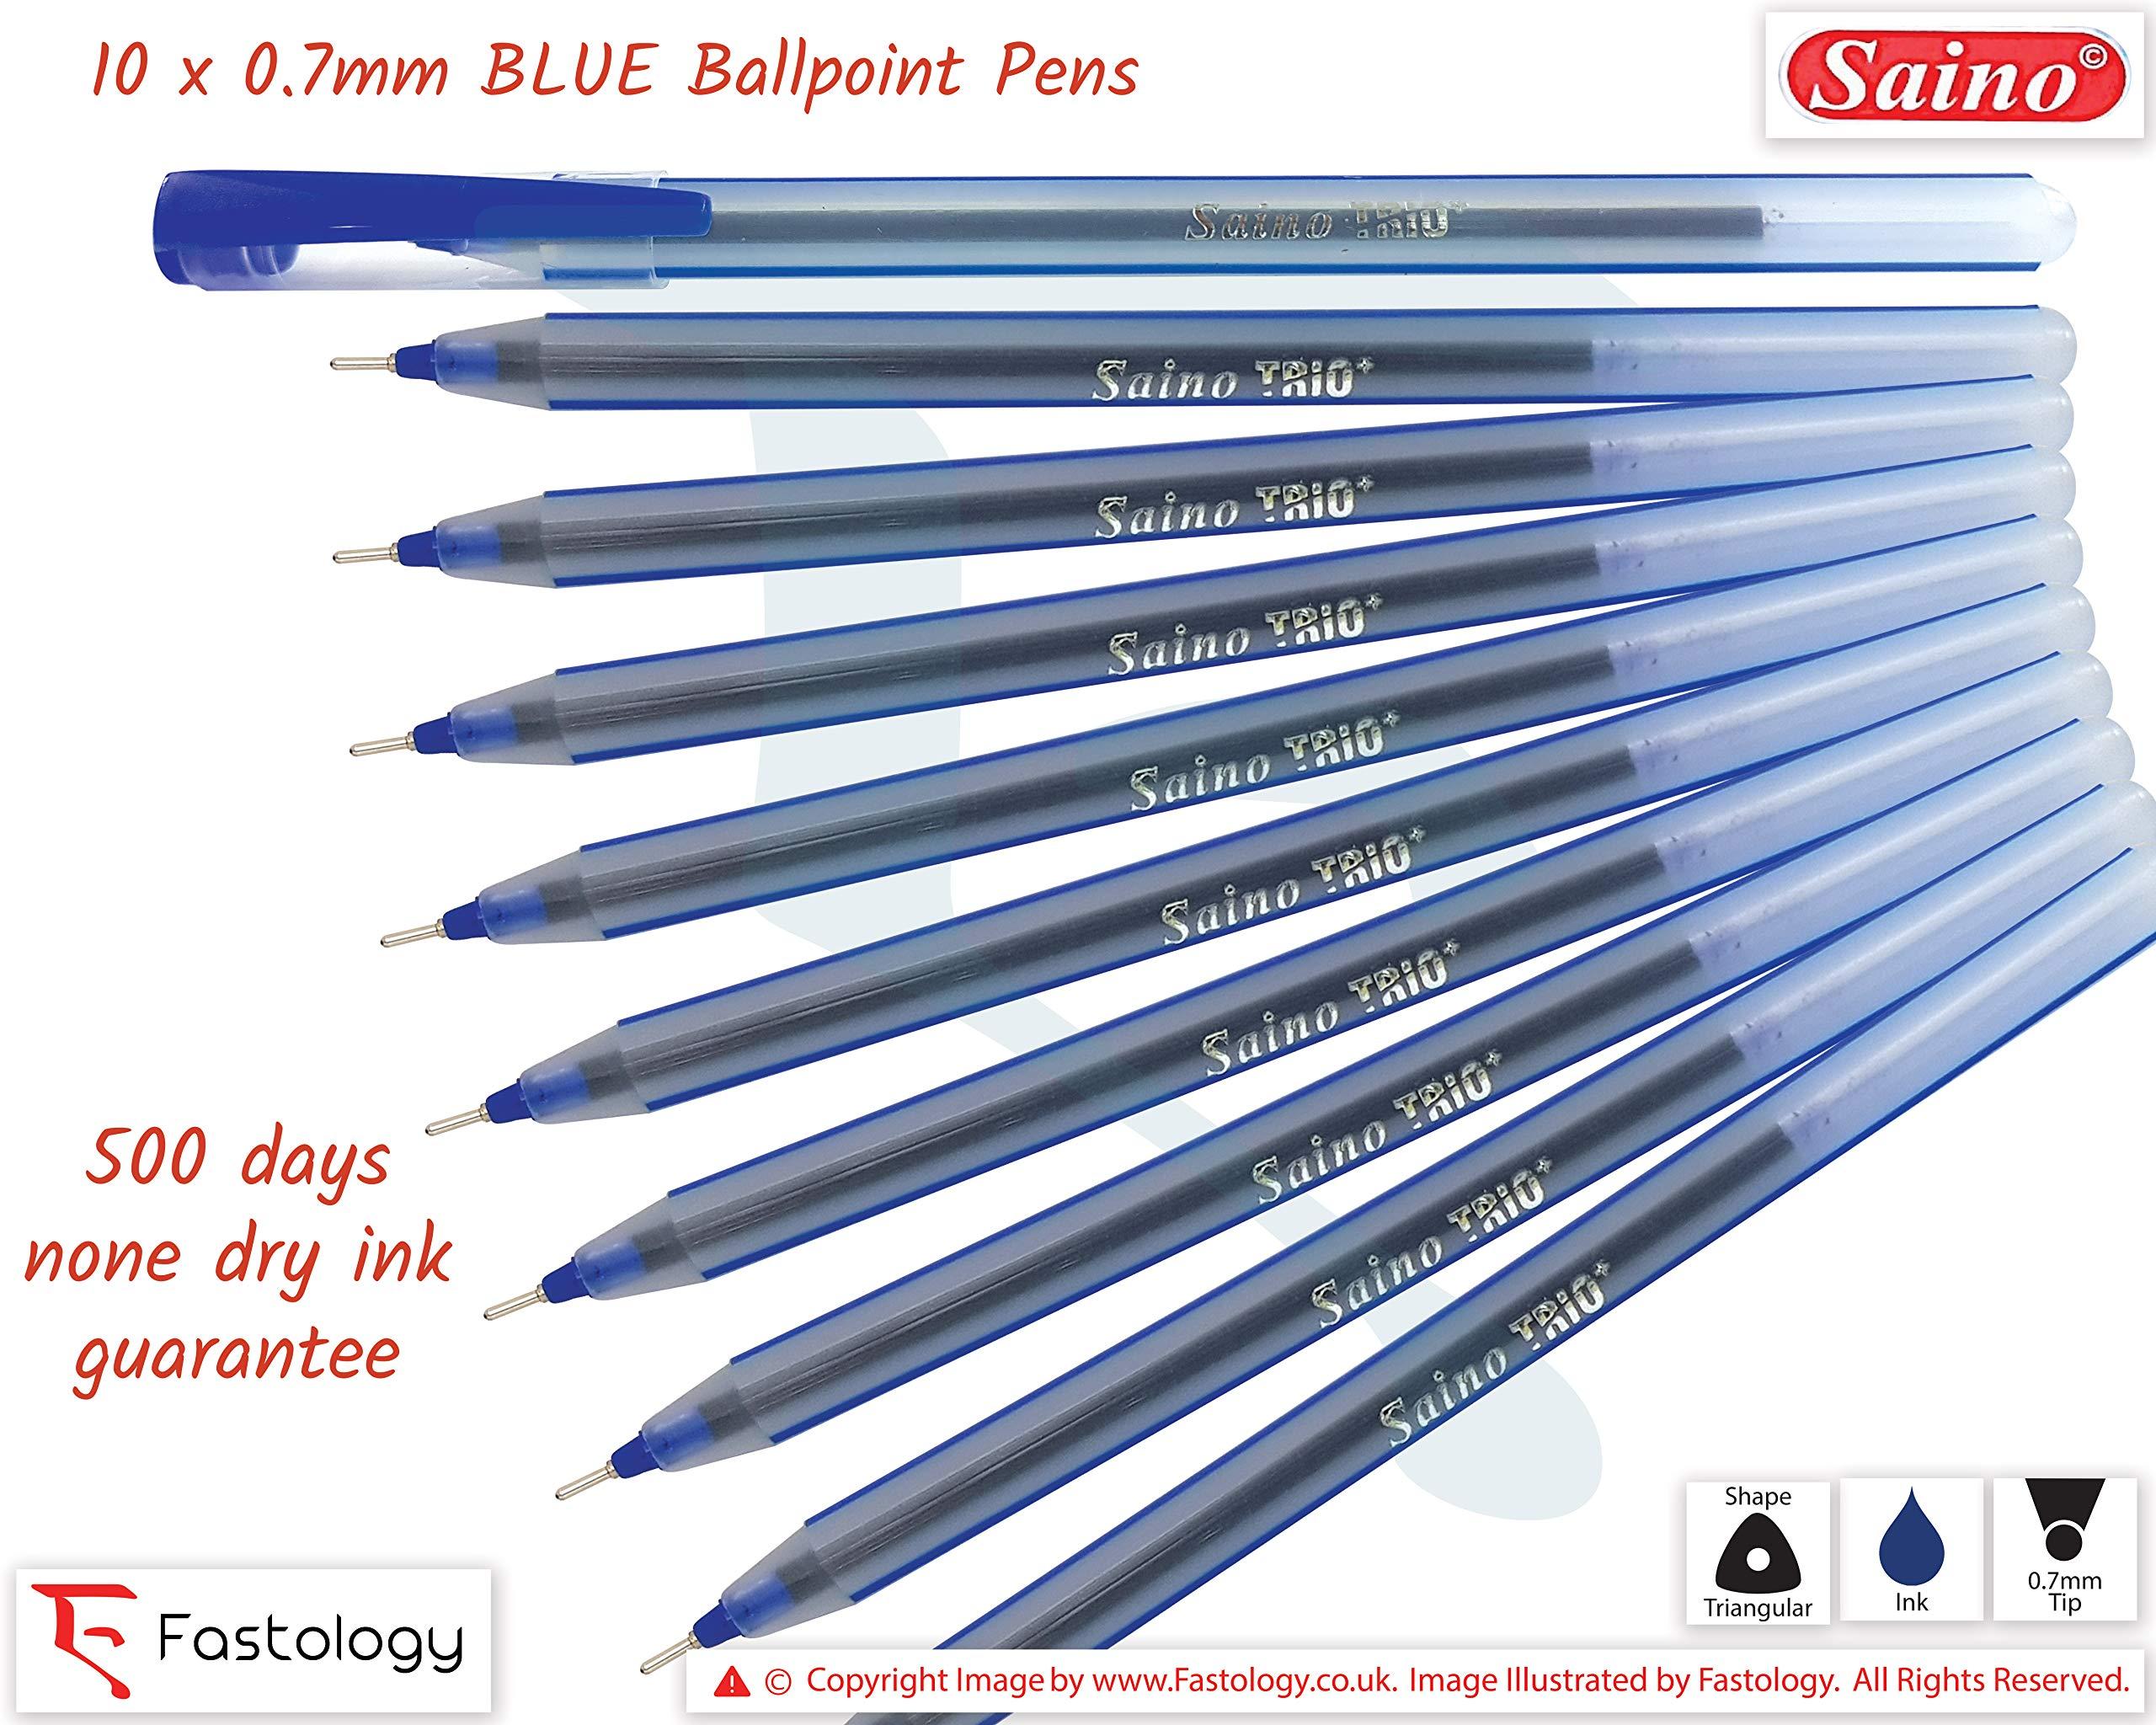 SAINO Trio 10 x 0.7mm Point BLUE Ballpoint Pens Smooth Fine Writing School Office Business Supplies